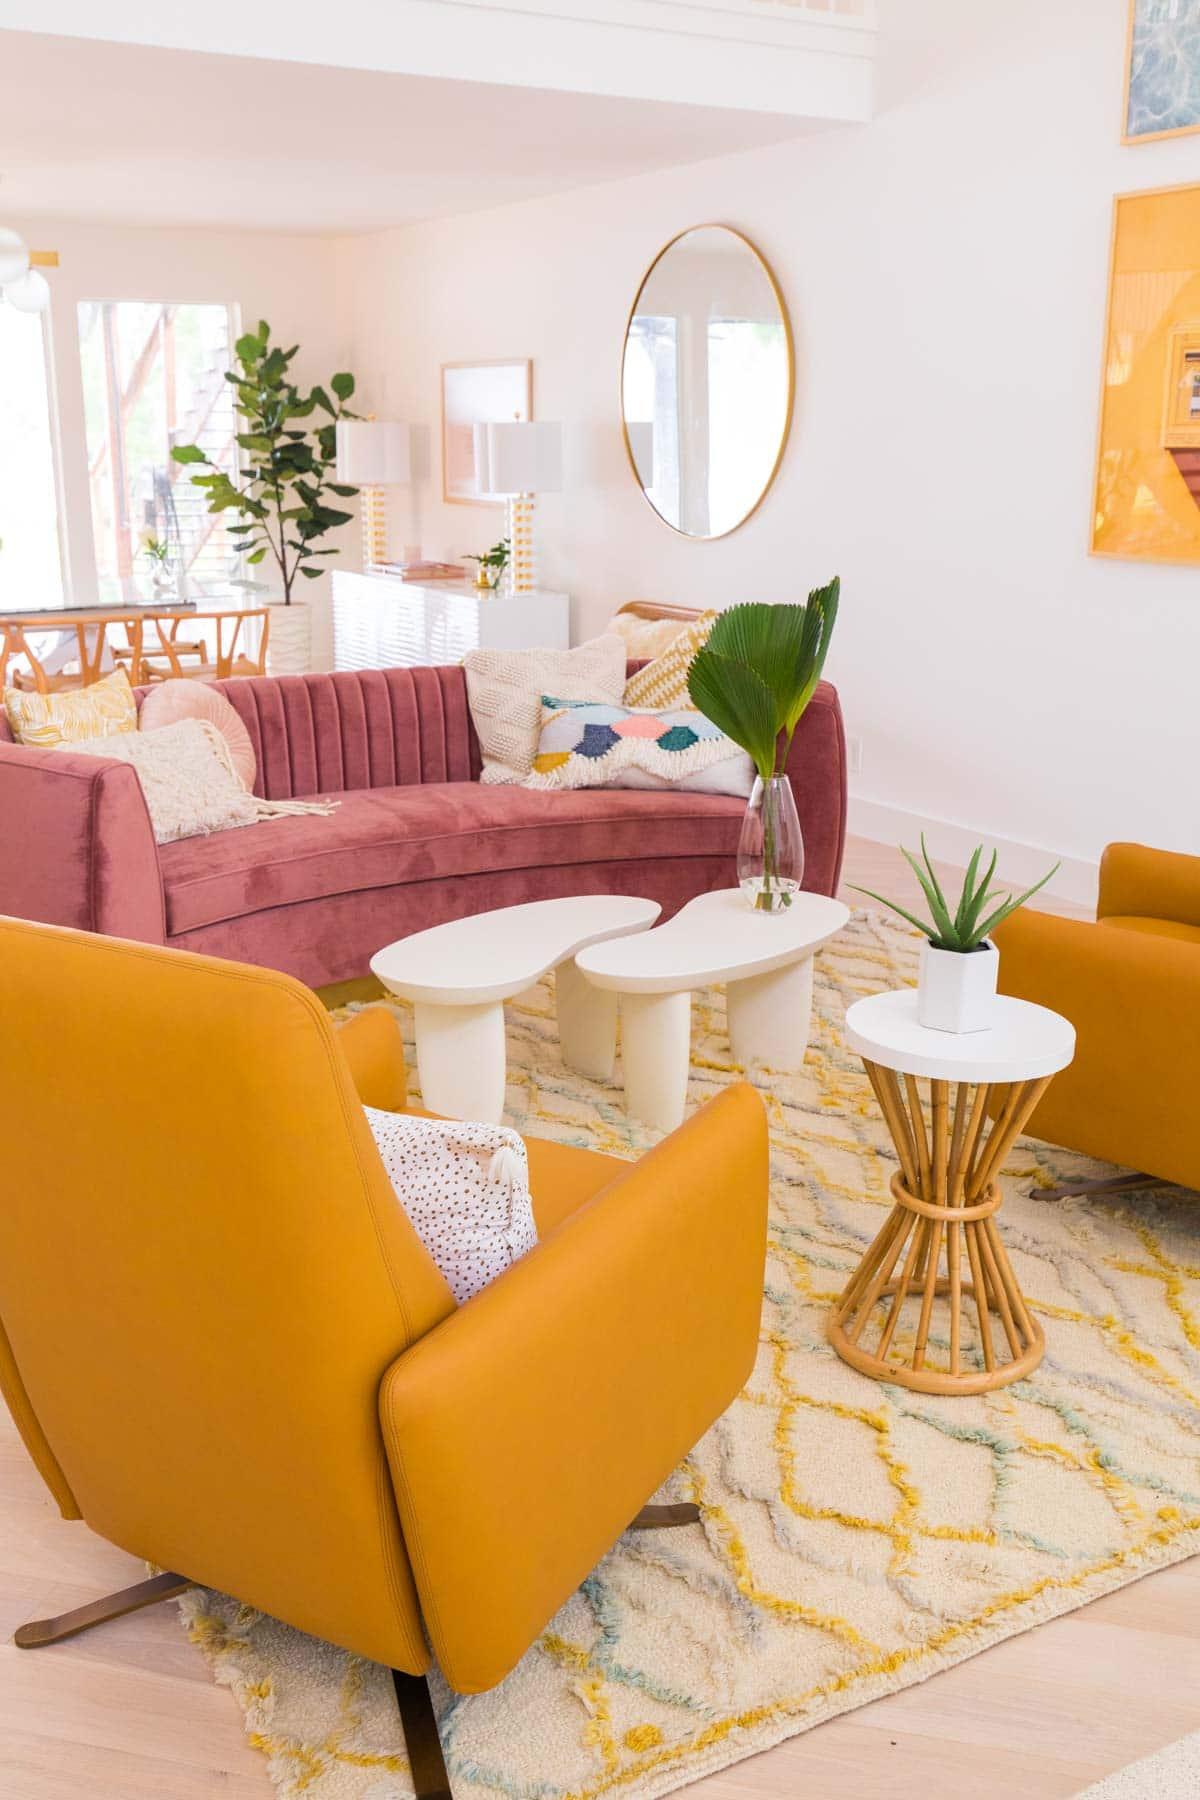 Modern Yellow Wingbacks and a Sofa